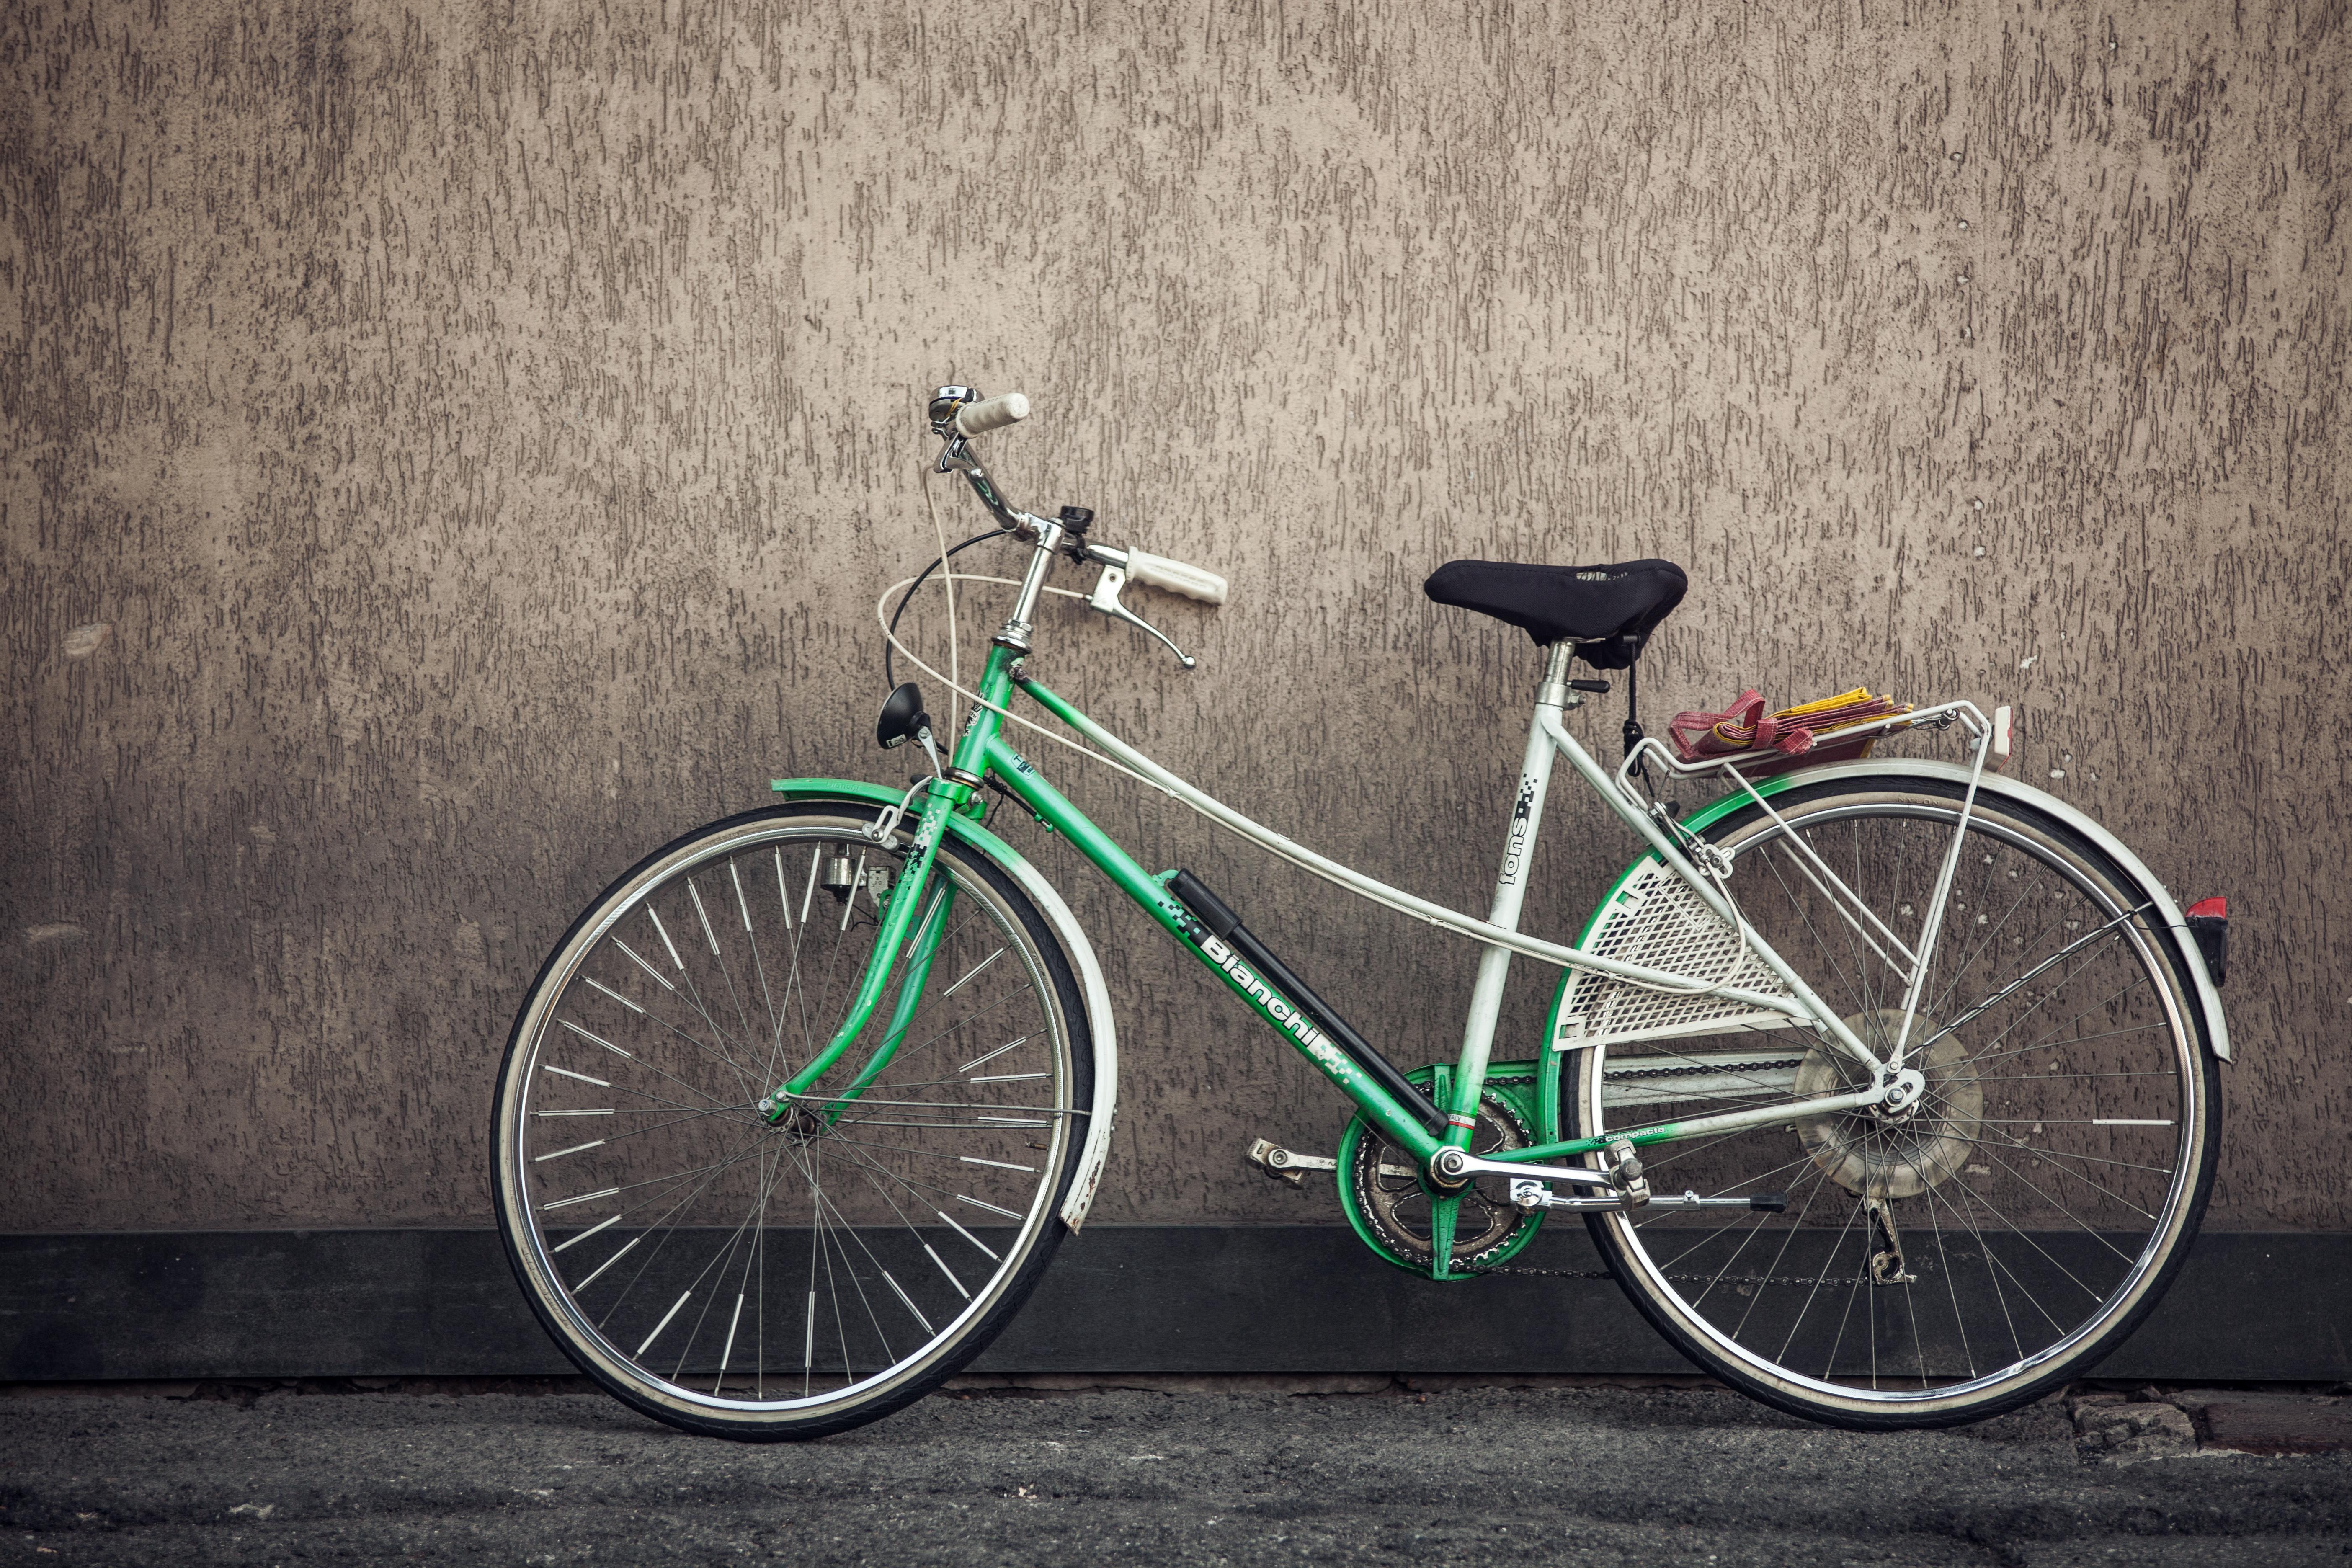 Kostenlose foto : Sport, Rad, Mauer, Transport, Grün, Fahrzeug, Öko ...